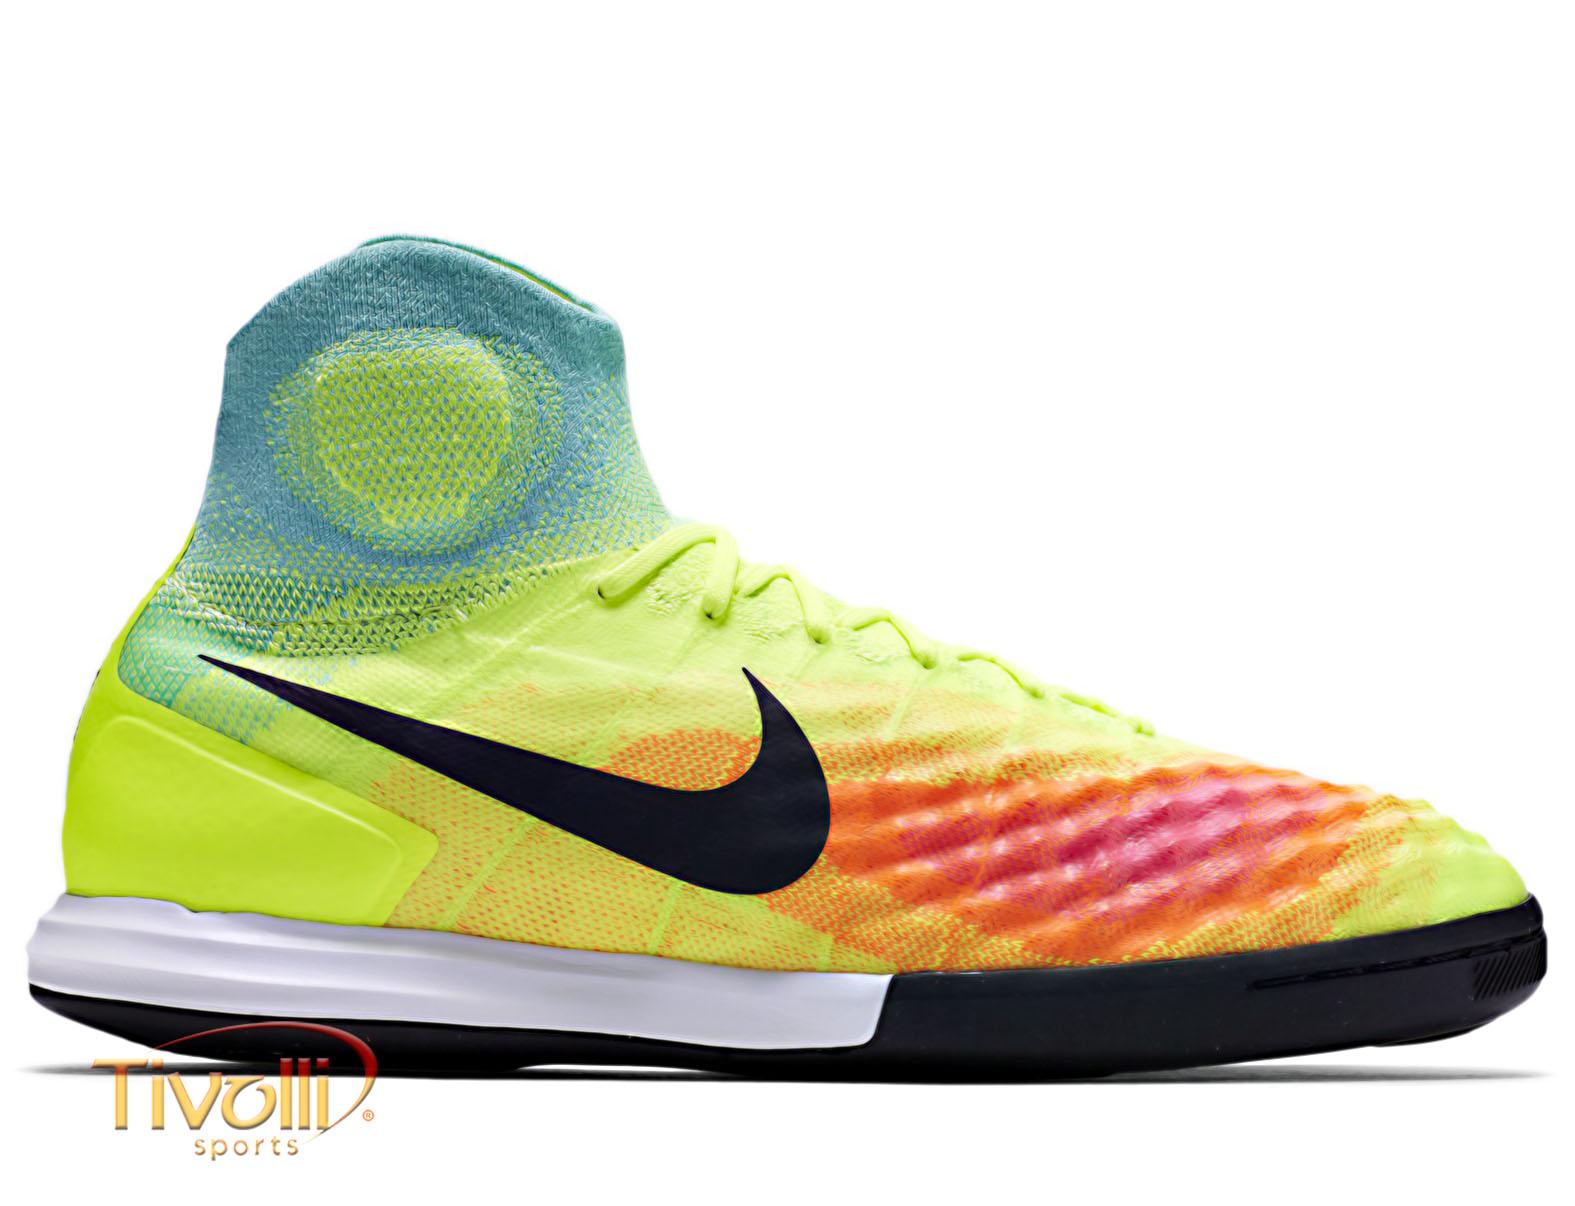 b02090d136 Chuteira Nike Jr MagistaX Proximo II ULTD IC Juvenil Futsal Amarela Flúor